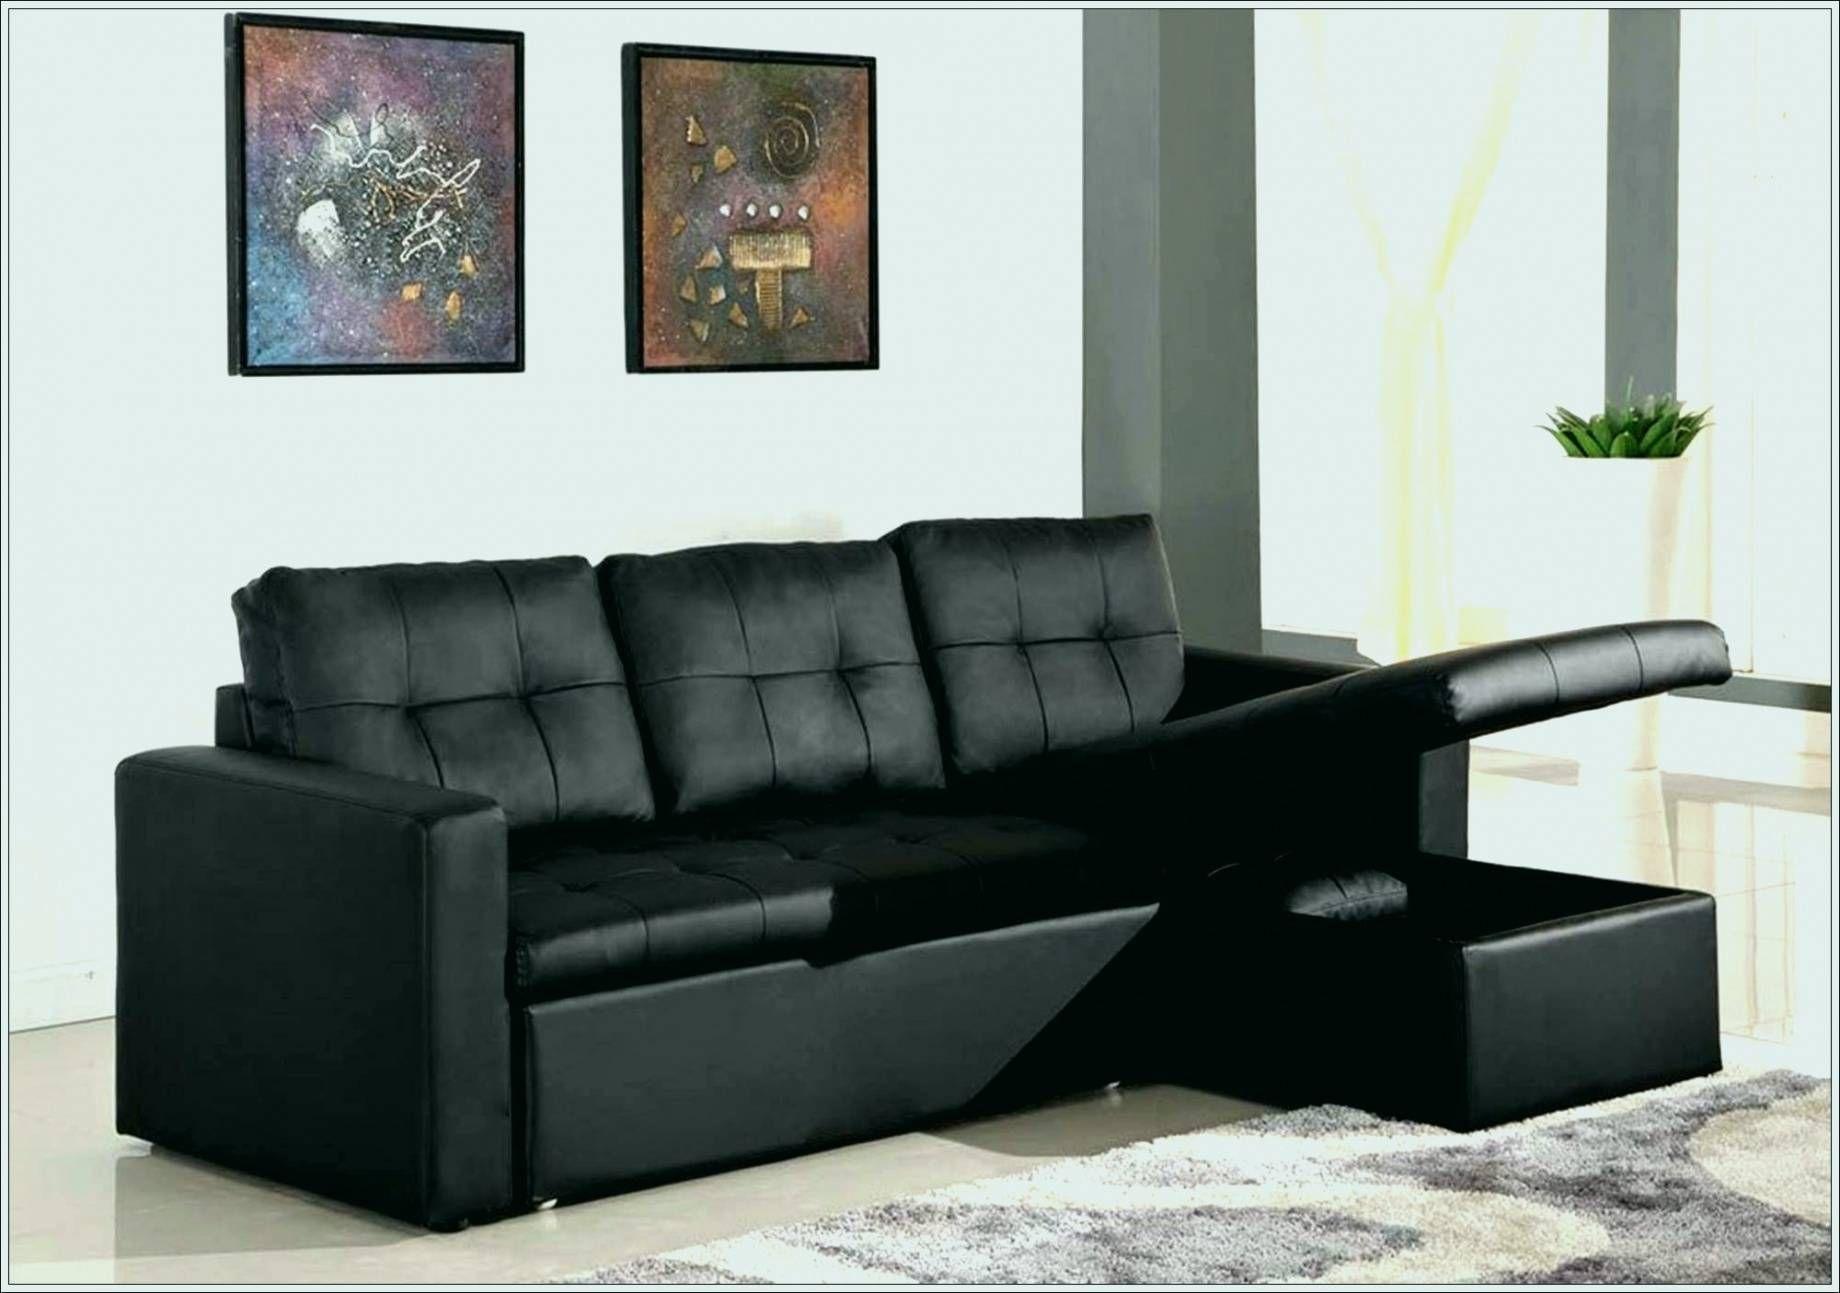 Canape Convertible Occasion Le Bon Coin Ou Acheter Un Canape Convertible Puredebrideur Le B In 2020 Home Decor Design Sectional Couch